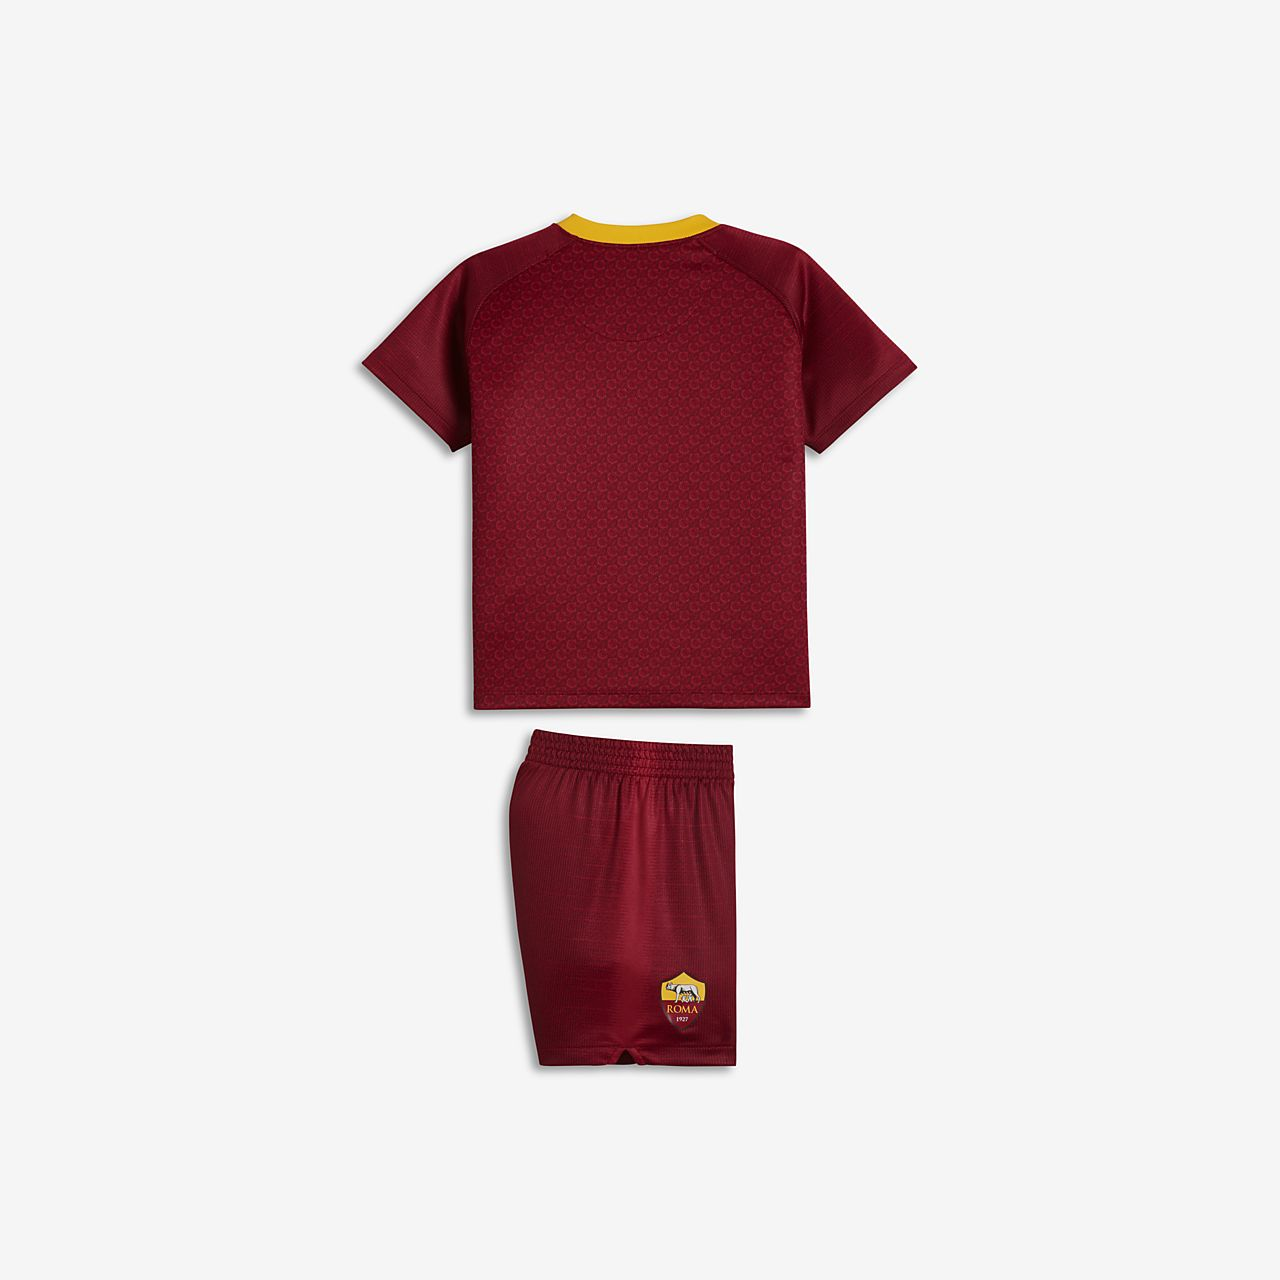 06ab1d3cc 2018/19 A.S. Roma Stadium Home Baby Football Kit. Nike.com DK